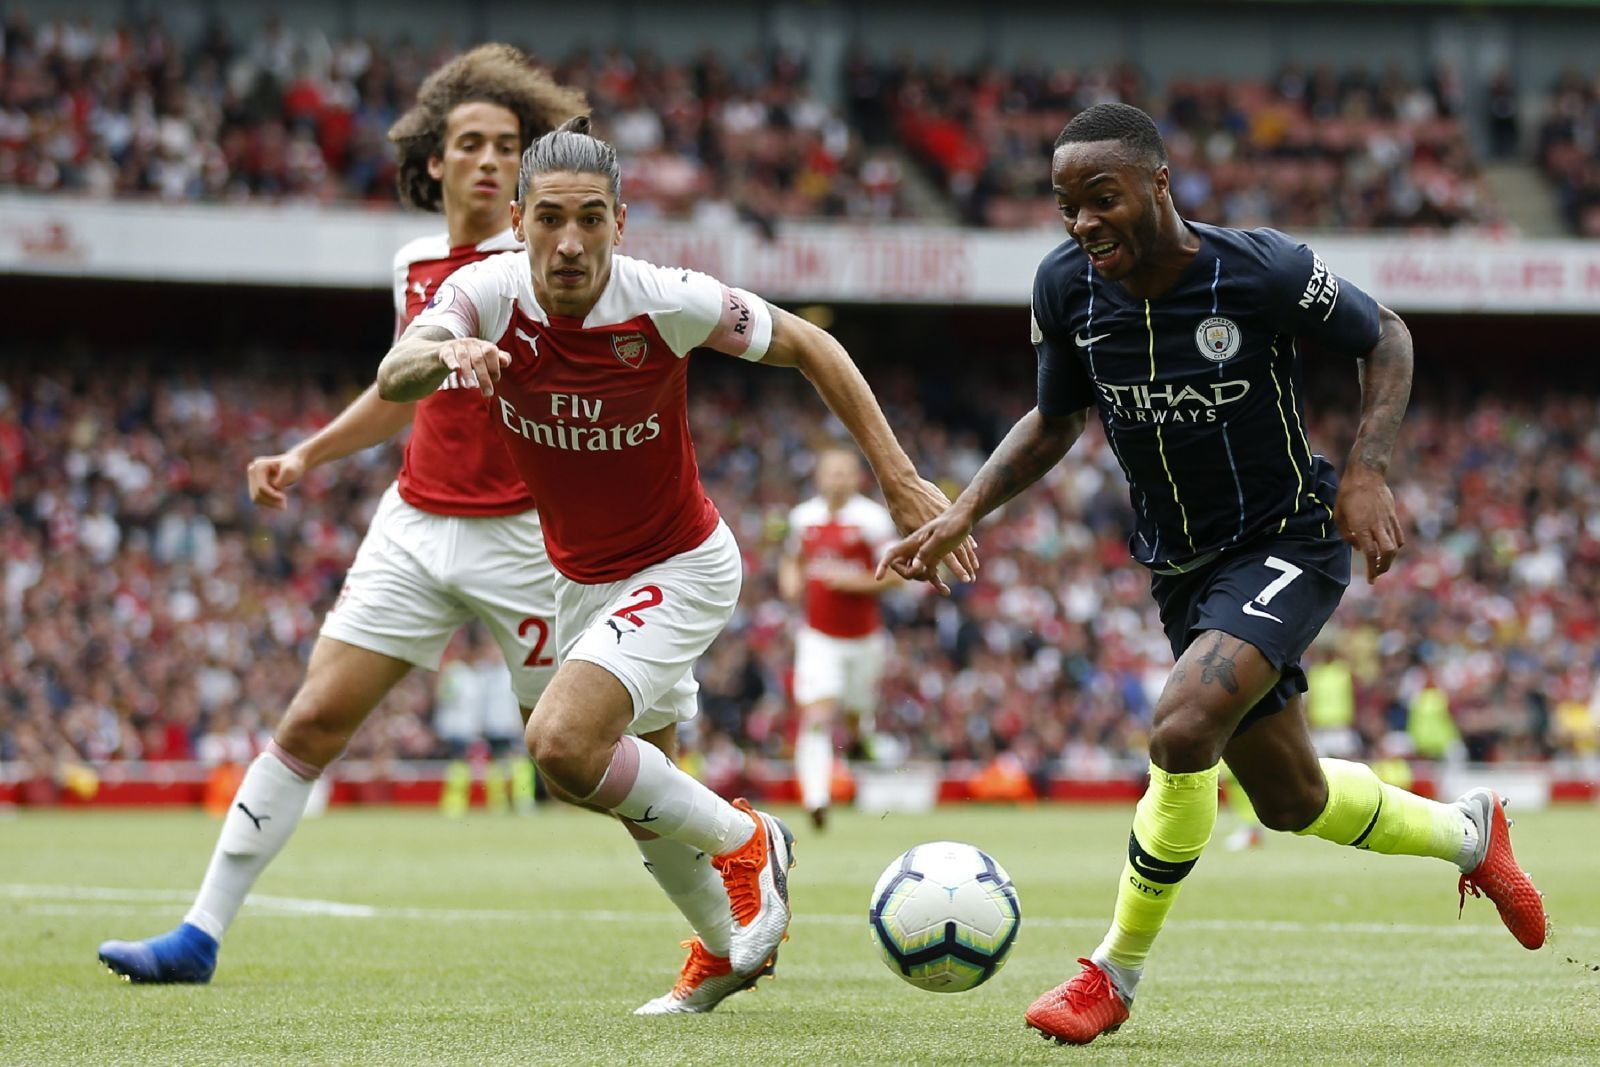 Premier League highlights and summary